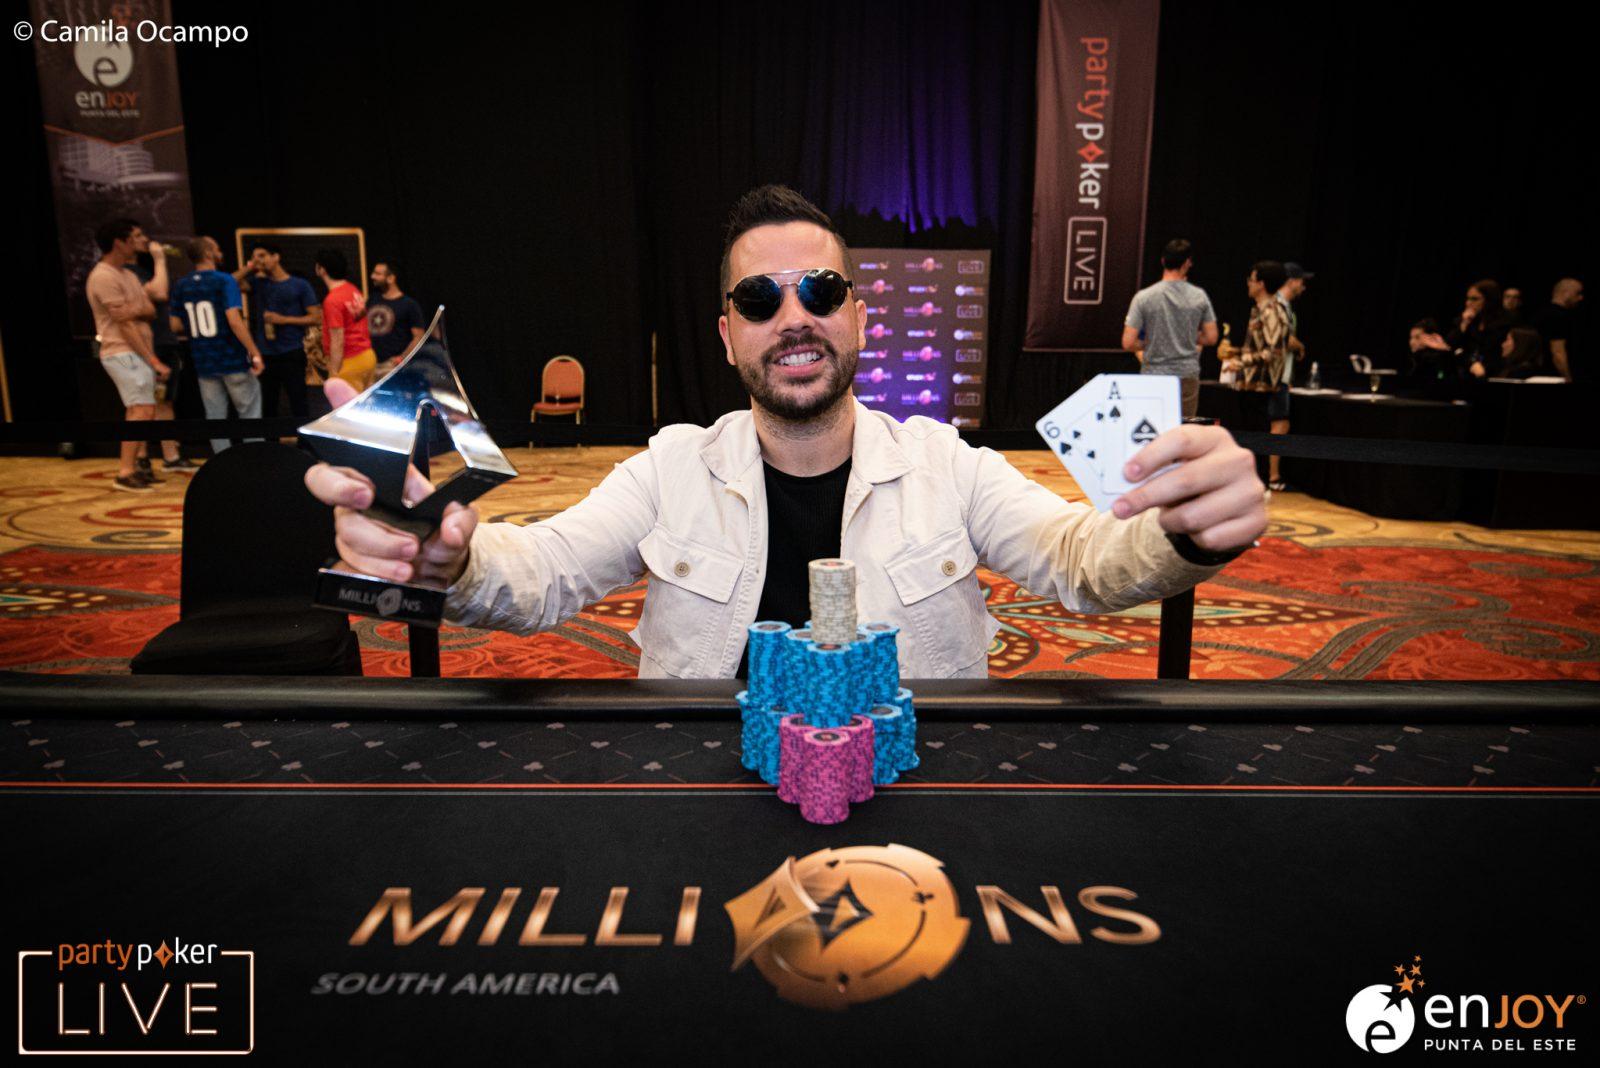 Farid Jattin wins partypoker MILLIONS South America High Roller!